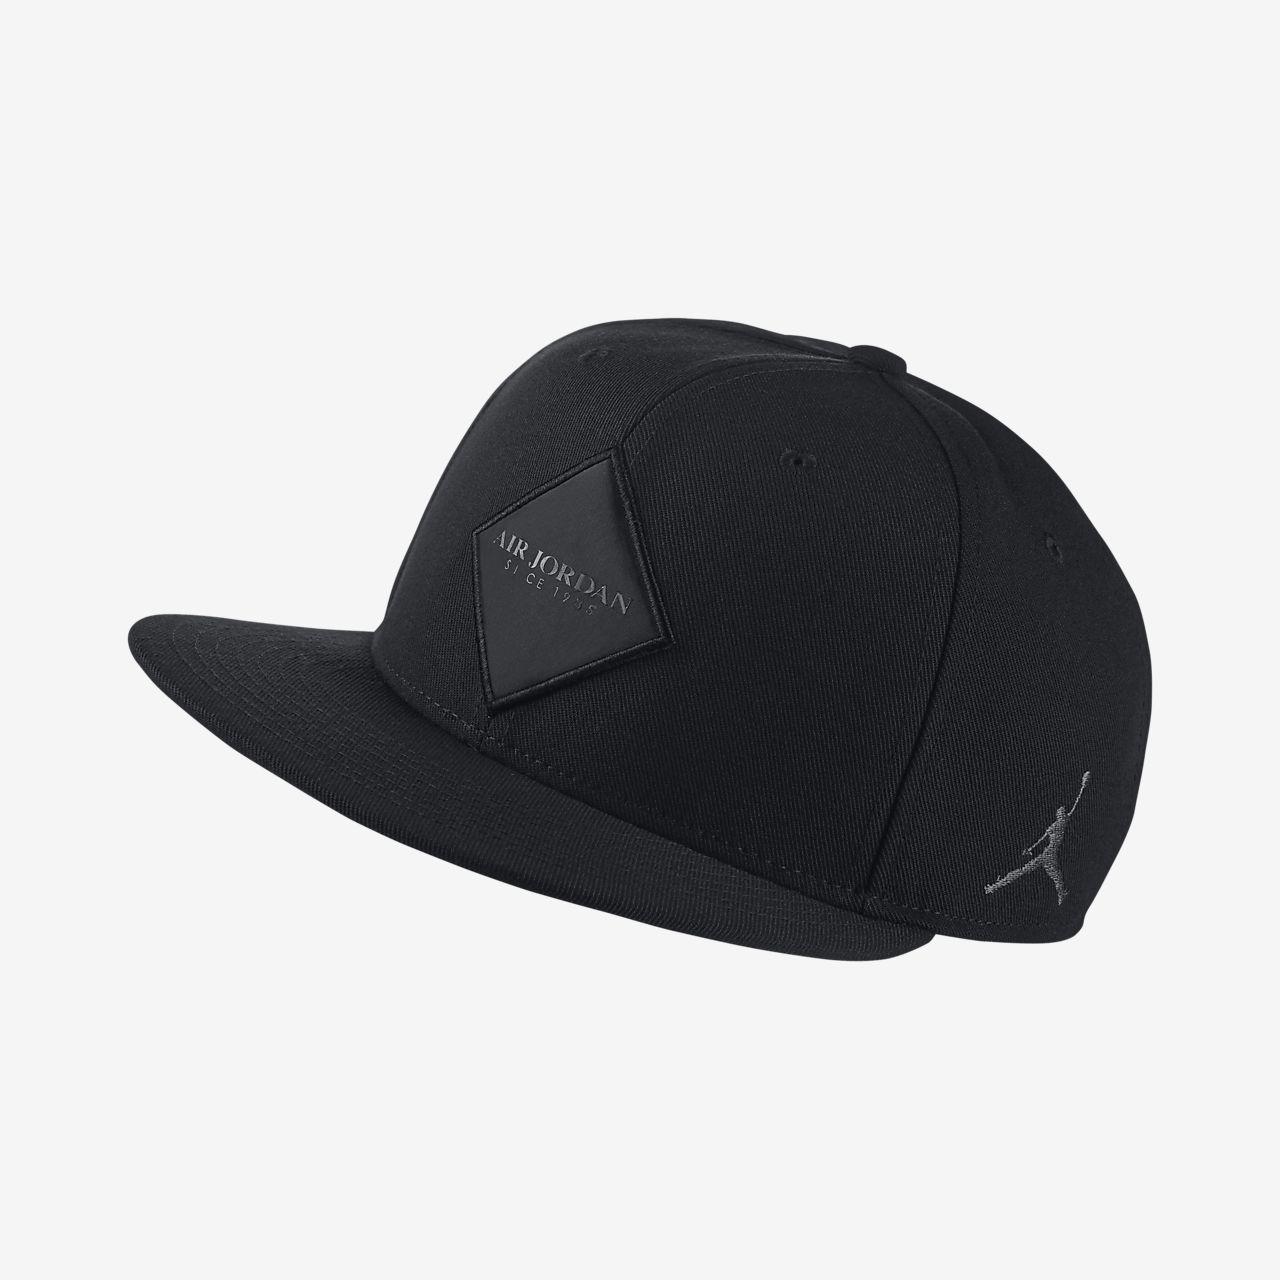 Jordan Jumpman True AJ 9 Adjustable Hat